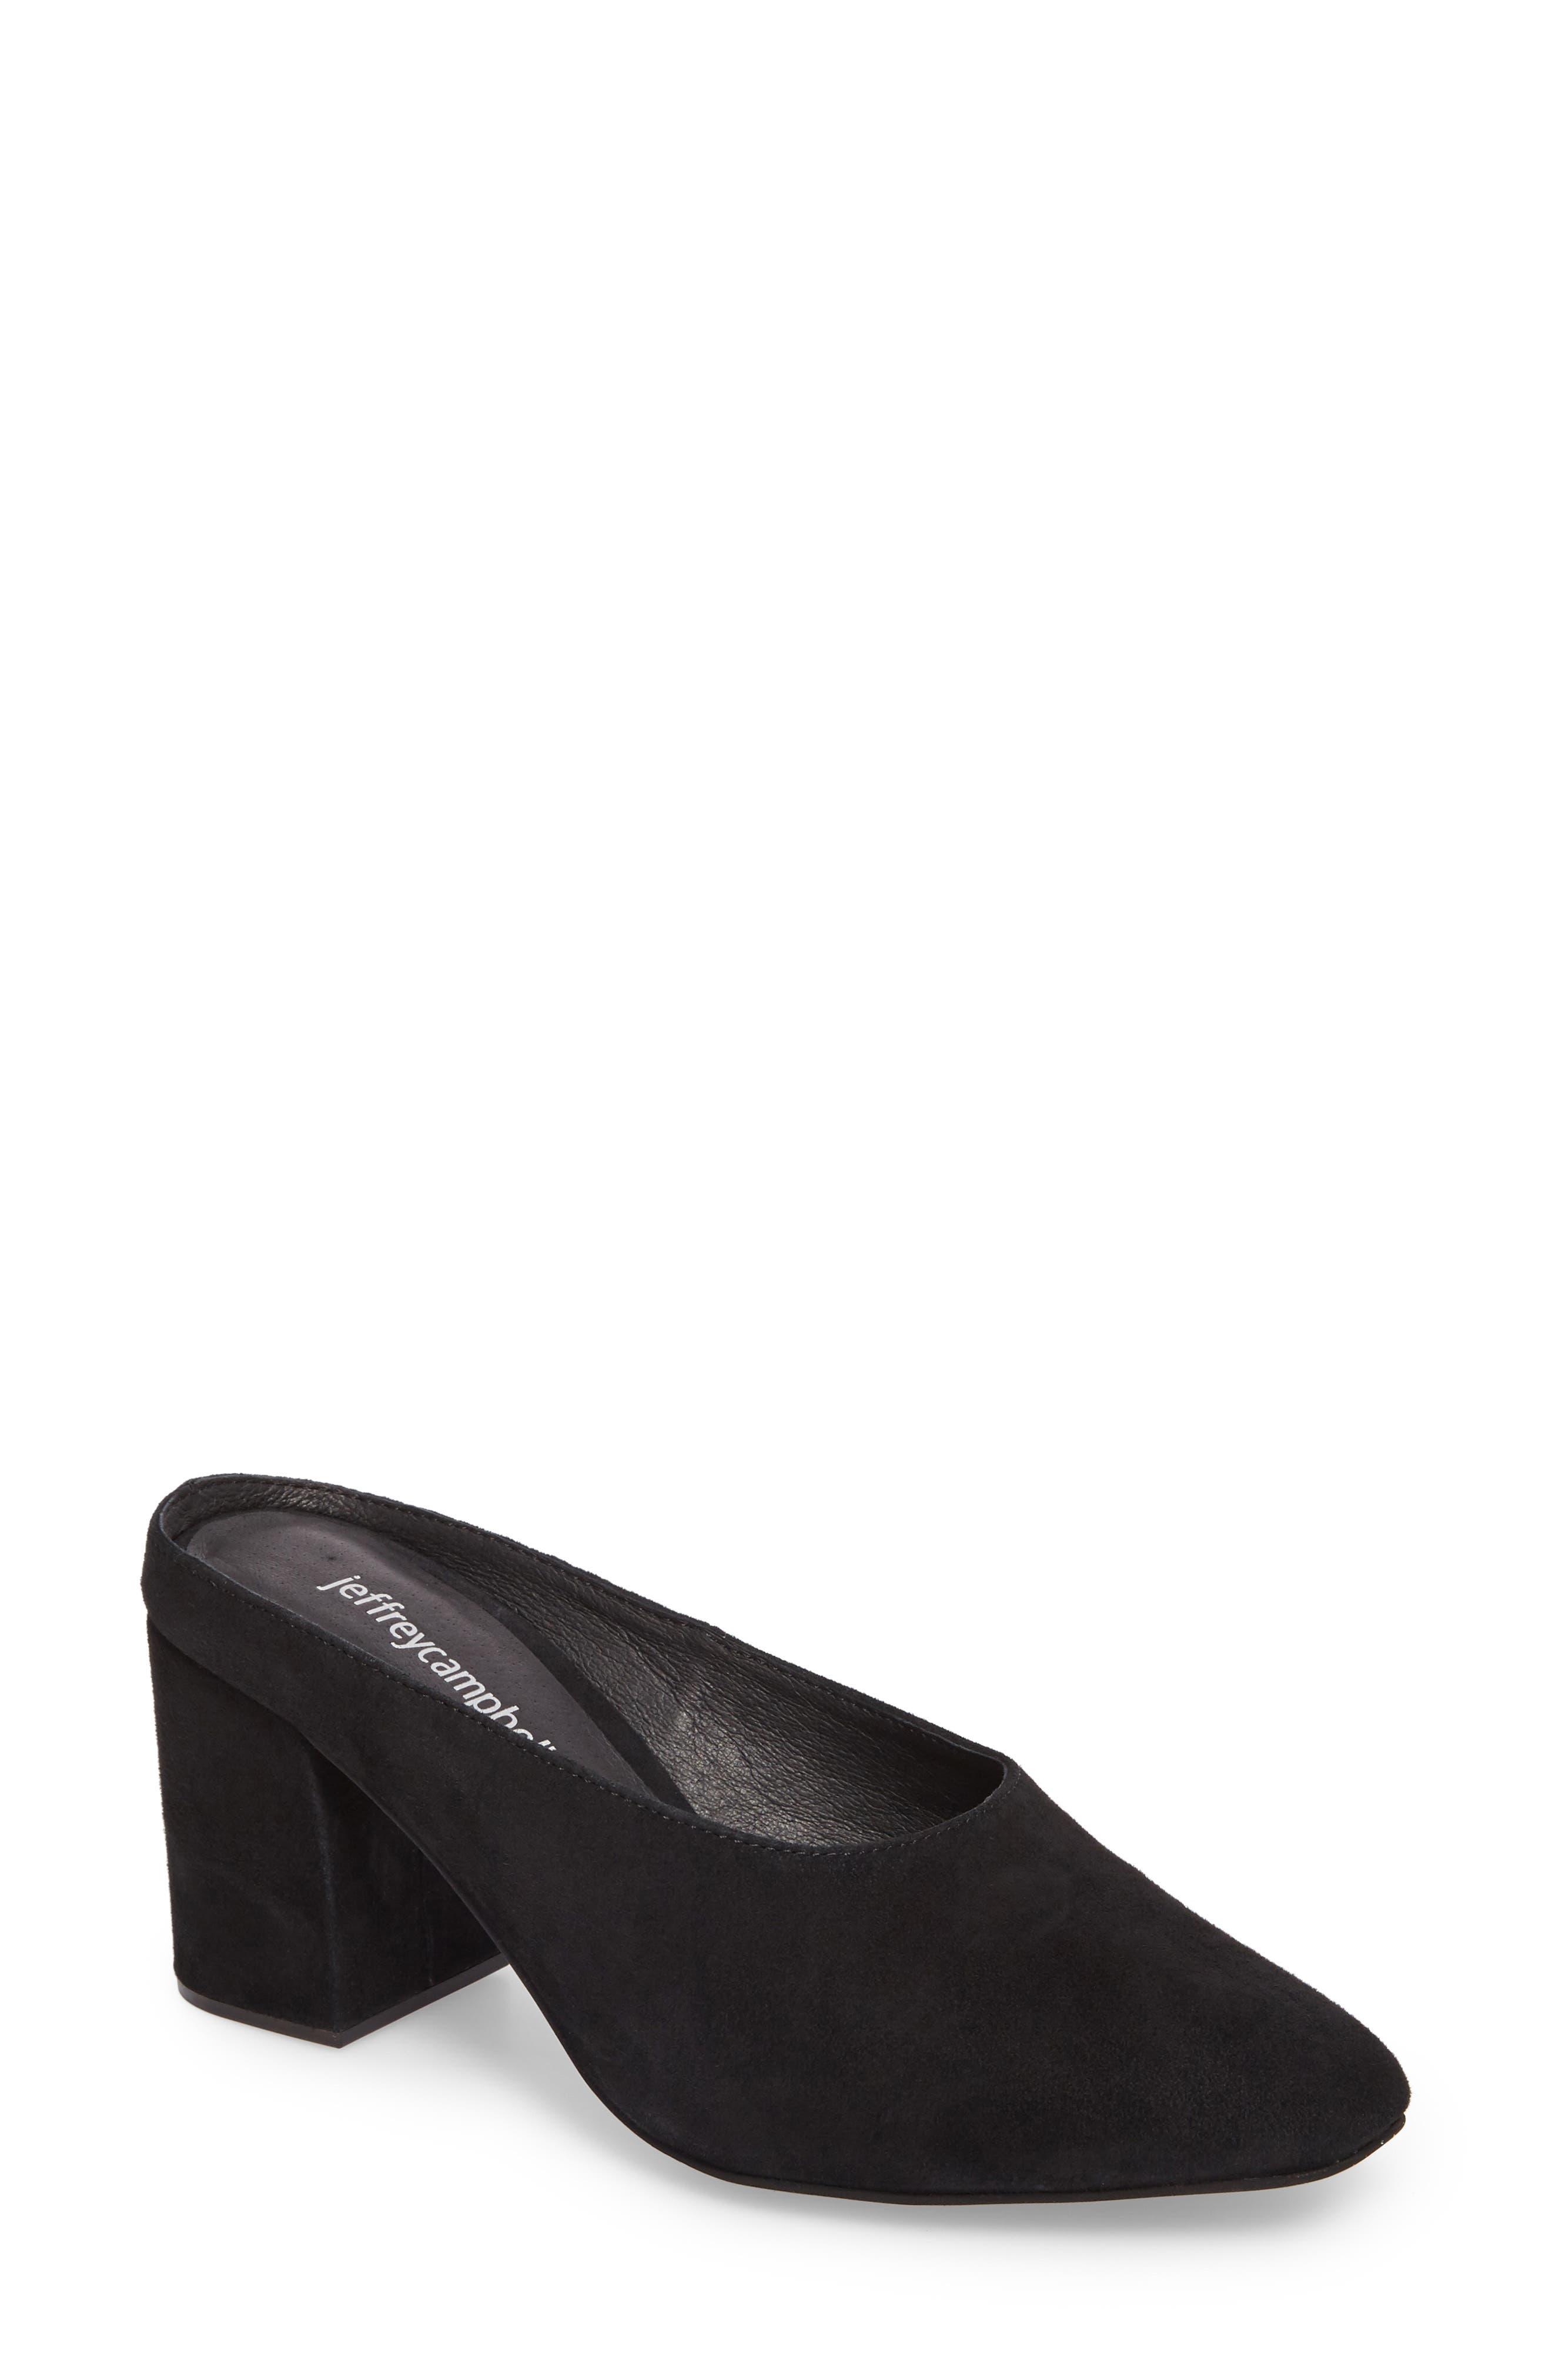 Lamer Mule,                         Main,                         color, Black Suede